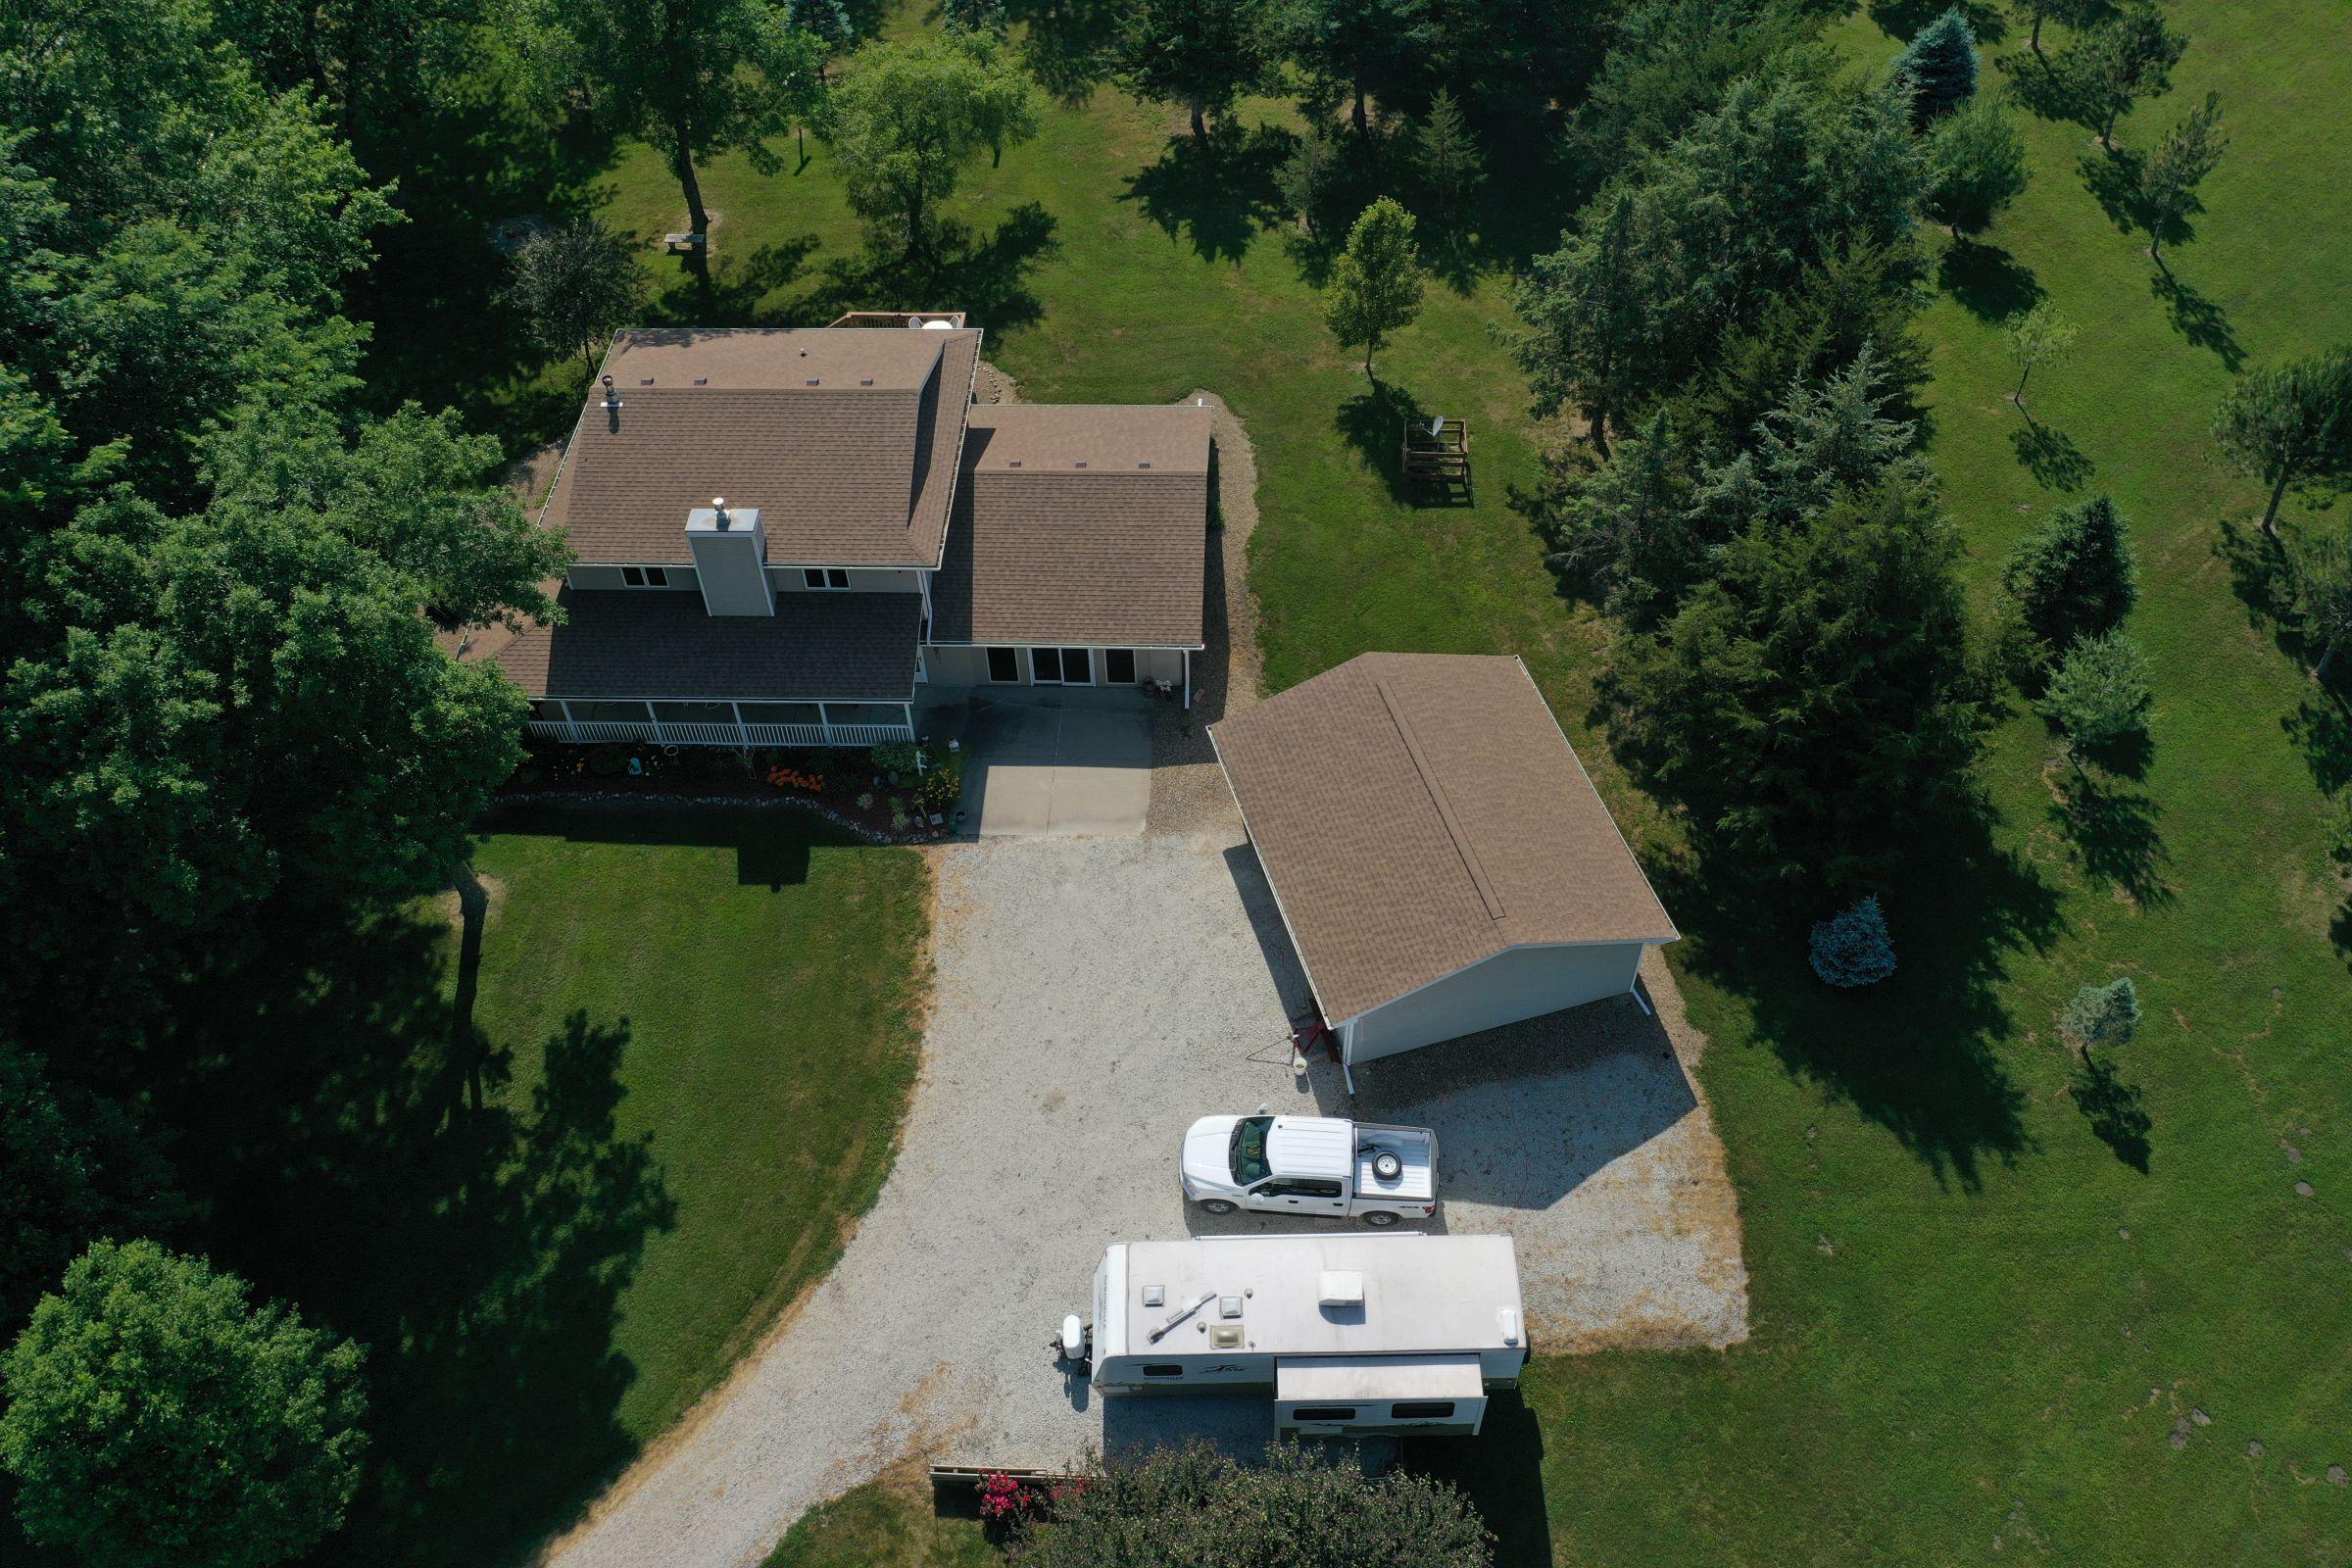 residential-warren-county-iowa-3-acres-listing-number-15593-0-2021-06-18-162232.JPG